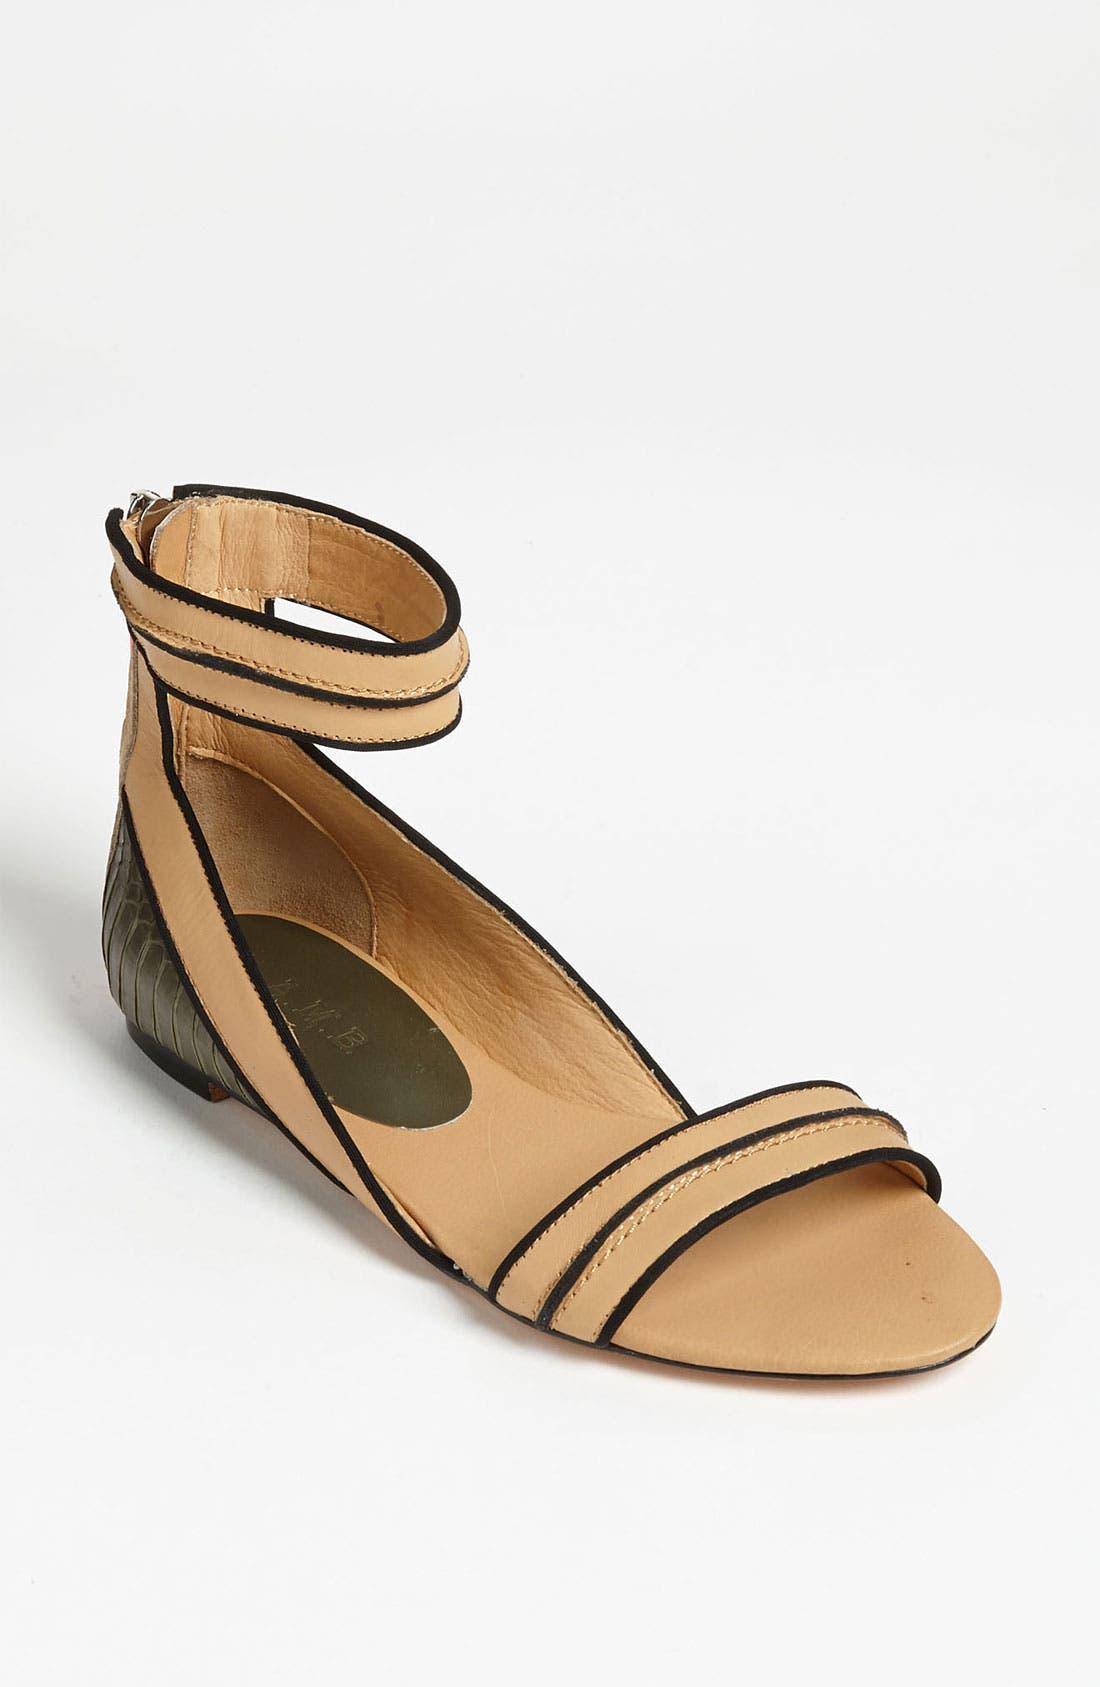 Alternate Image 1 Selected - L.A.M.B. 'Ciara' Sandal